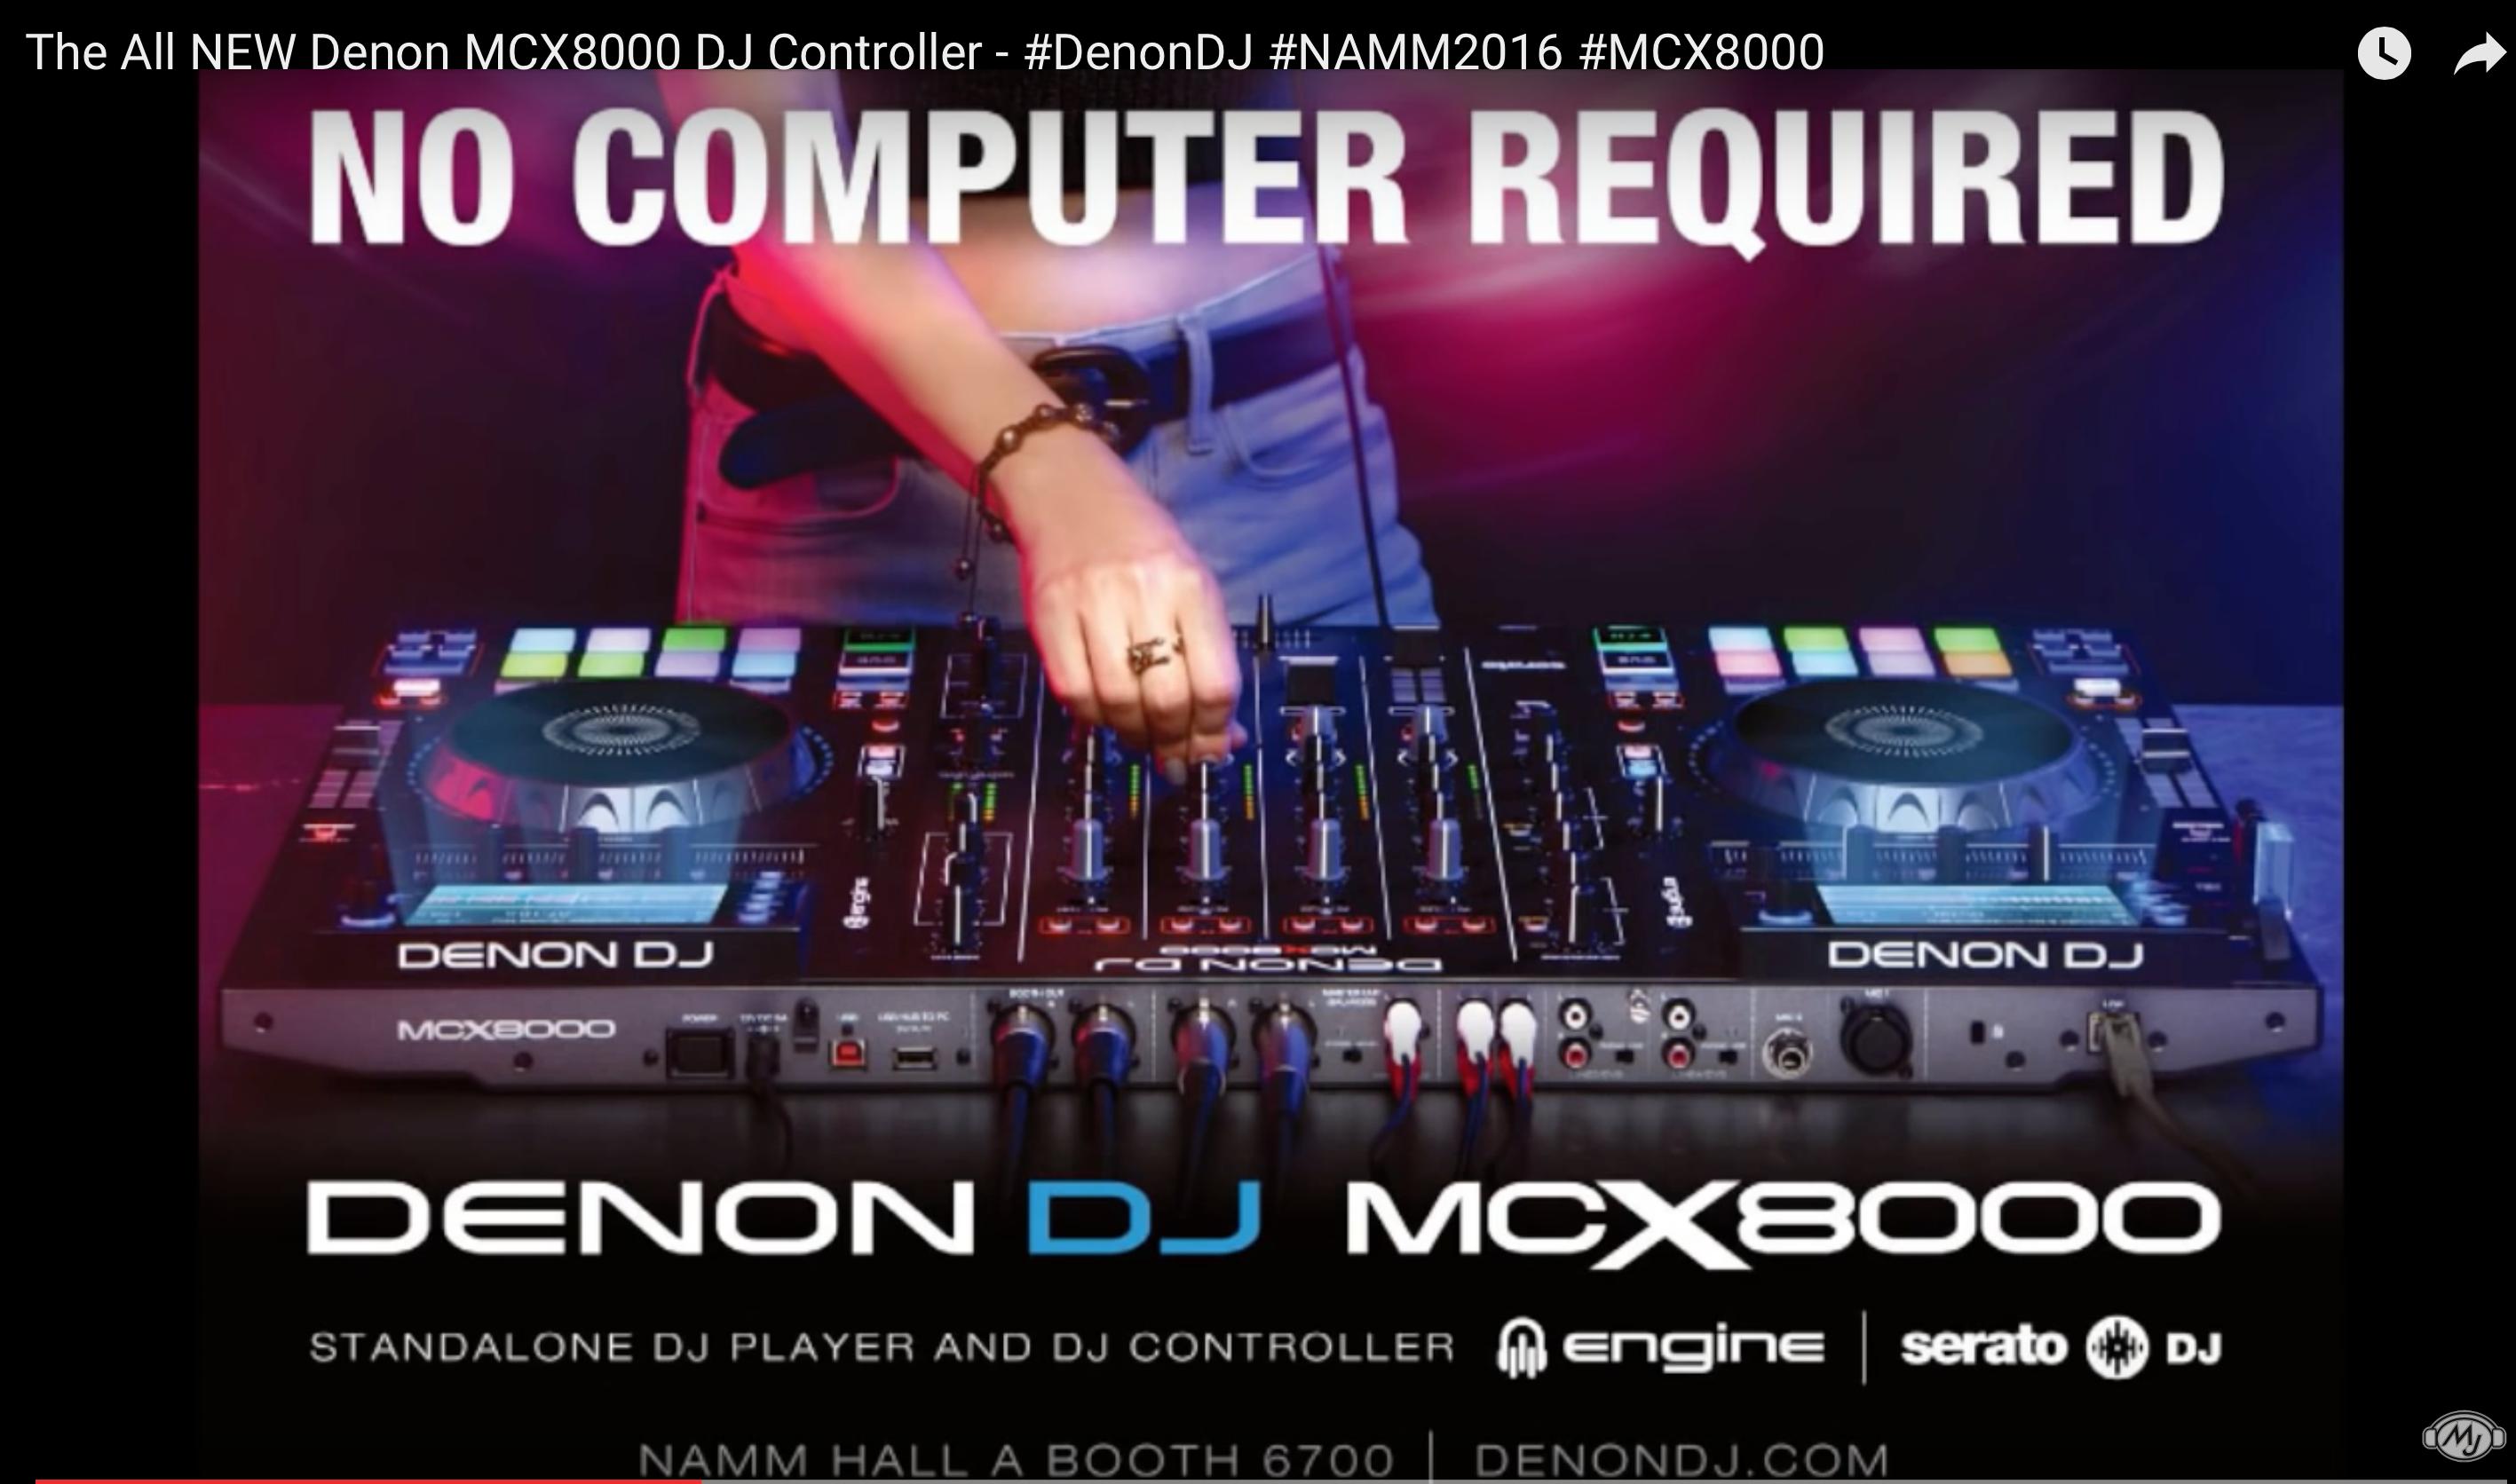 Leak: Denon DJ MCX8000 - Standalone DJ-Controller